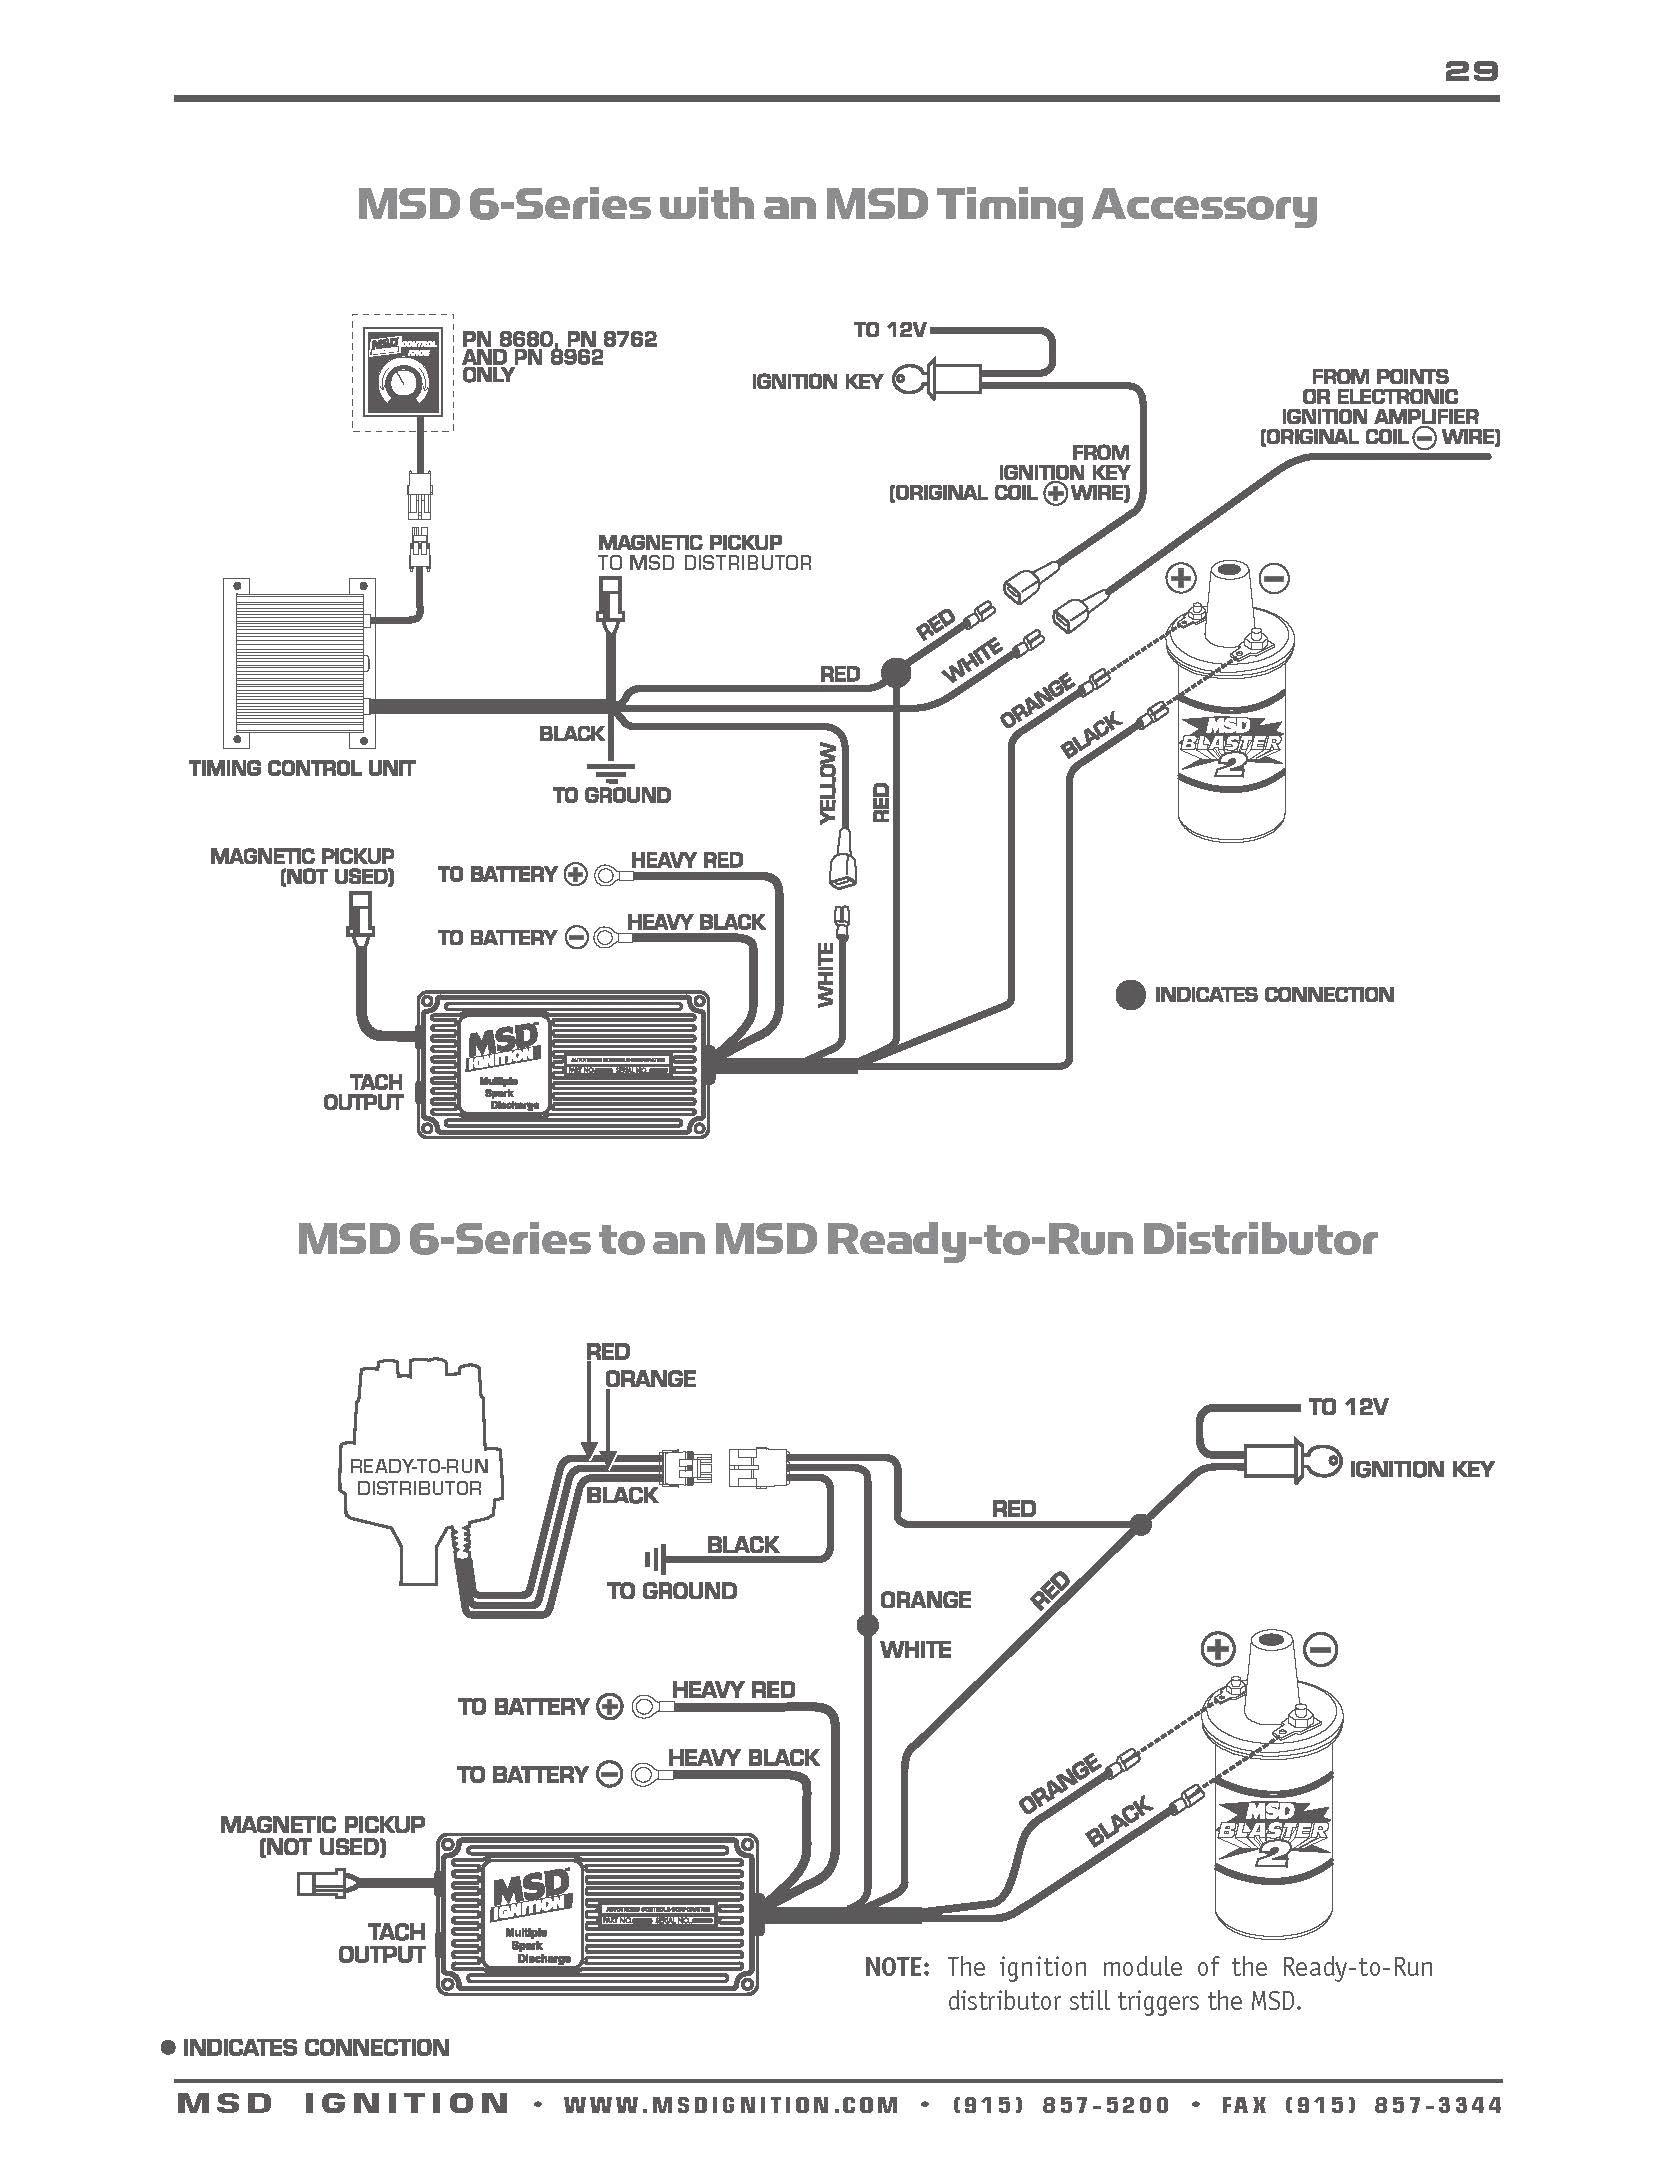 Msd 6tn Wiring Diagram Msd 6tn Wiring Diagram Wiring Diagram Operations